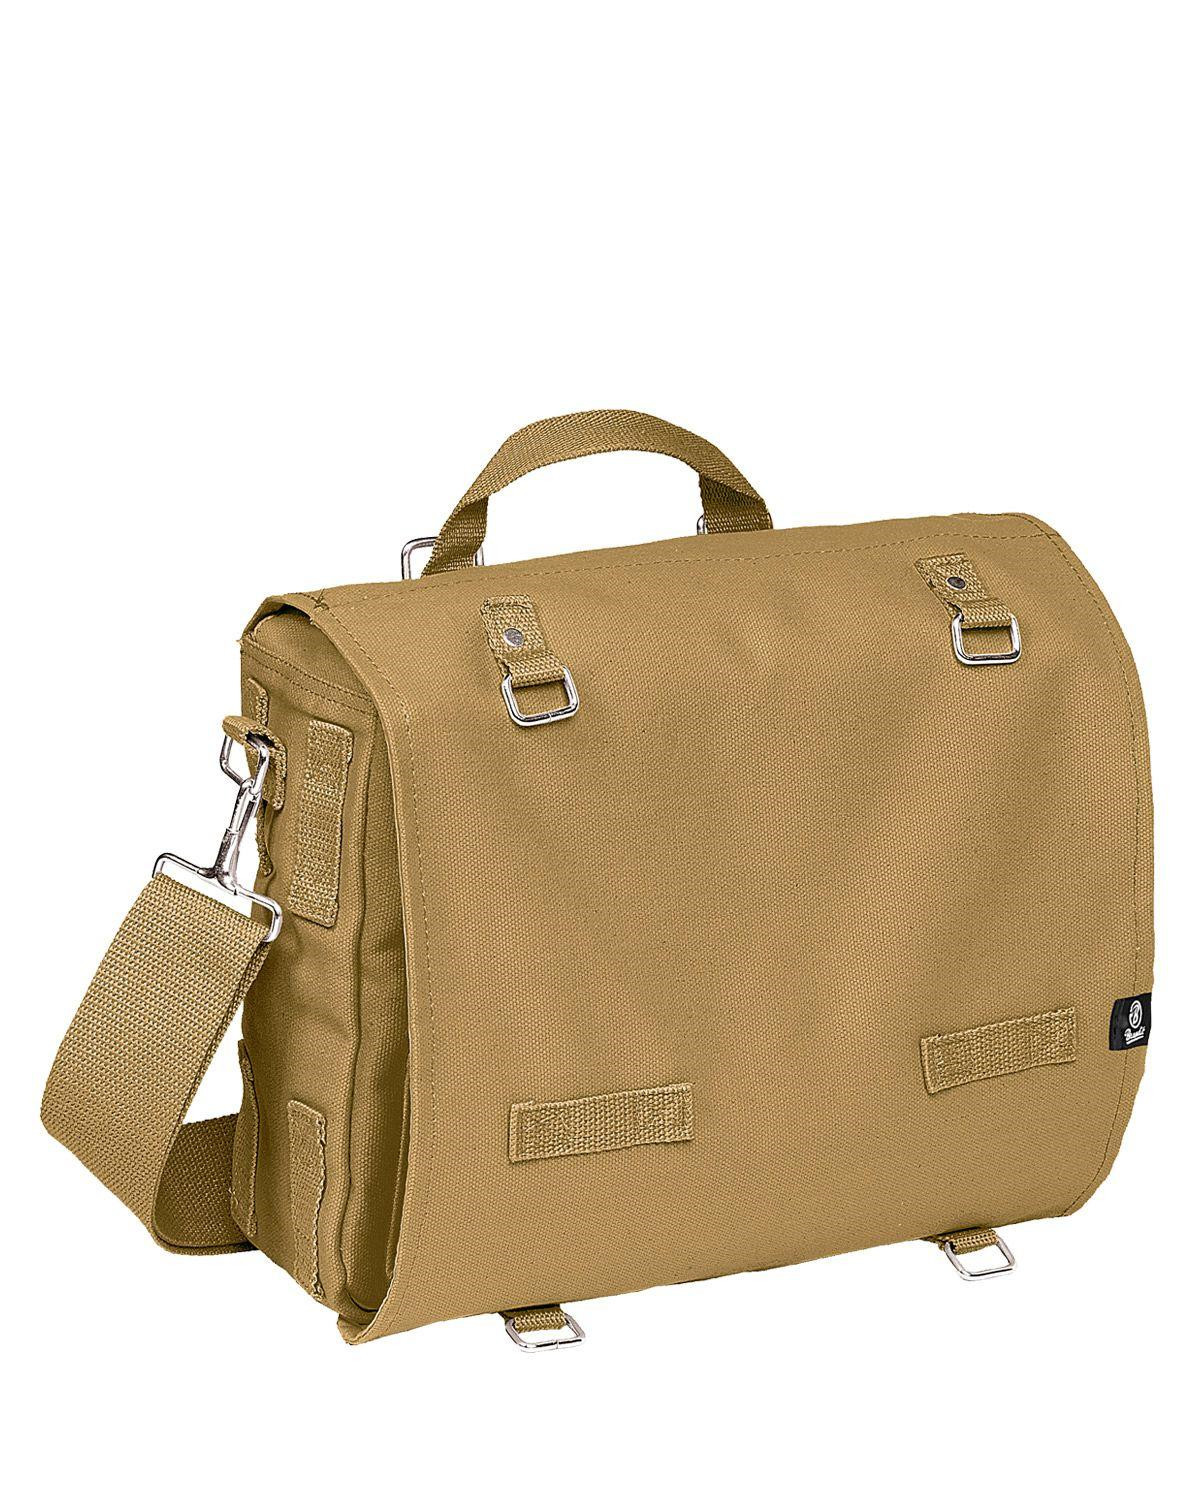 Brandit Canvas Bag Large Navy